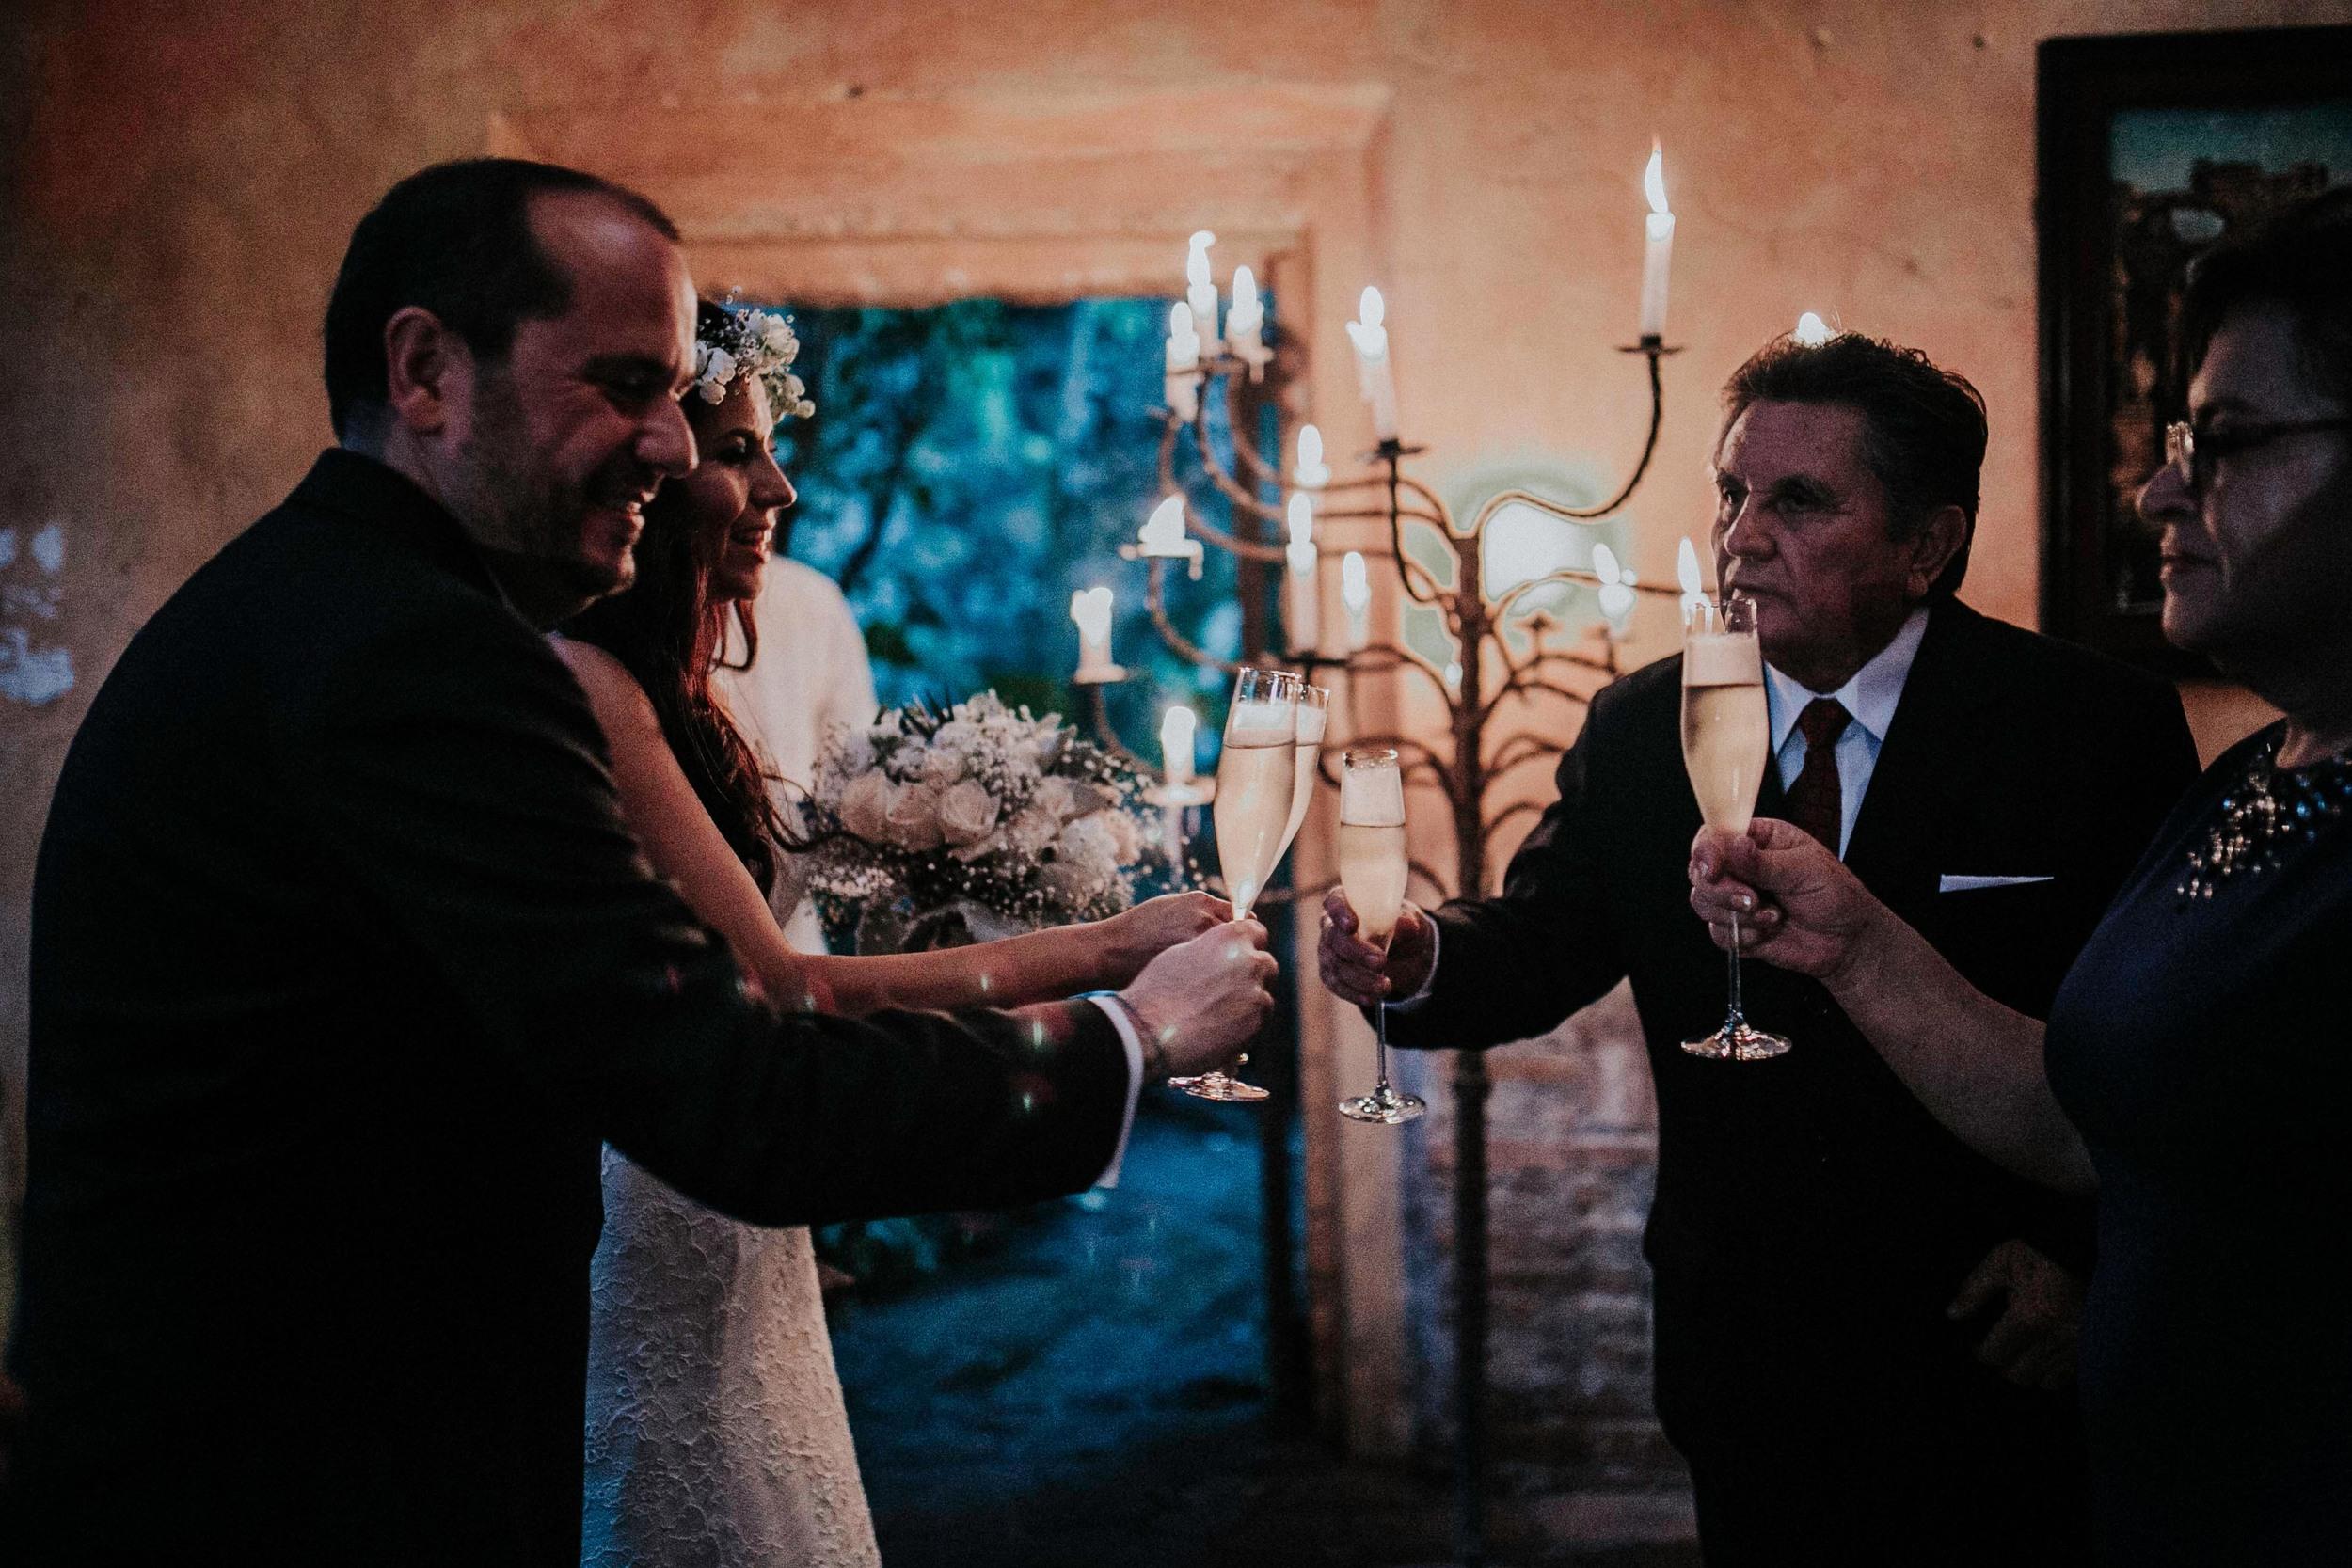 643A2218-Editaralfonso_flores_destination_wedding_photographer_San_gabriel_de_las_palmas.jpg